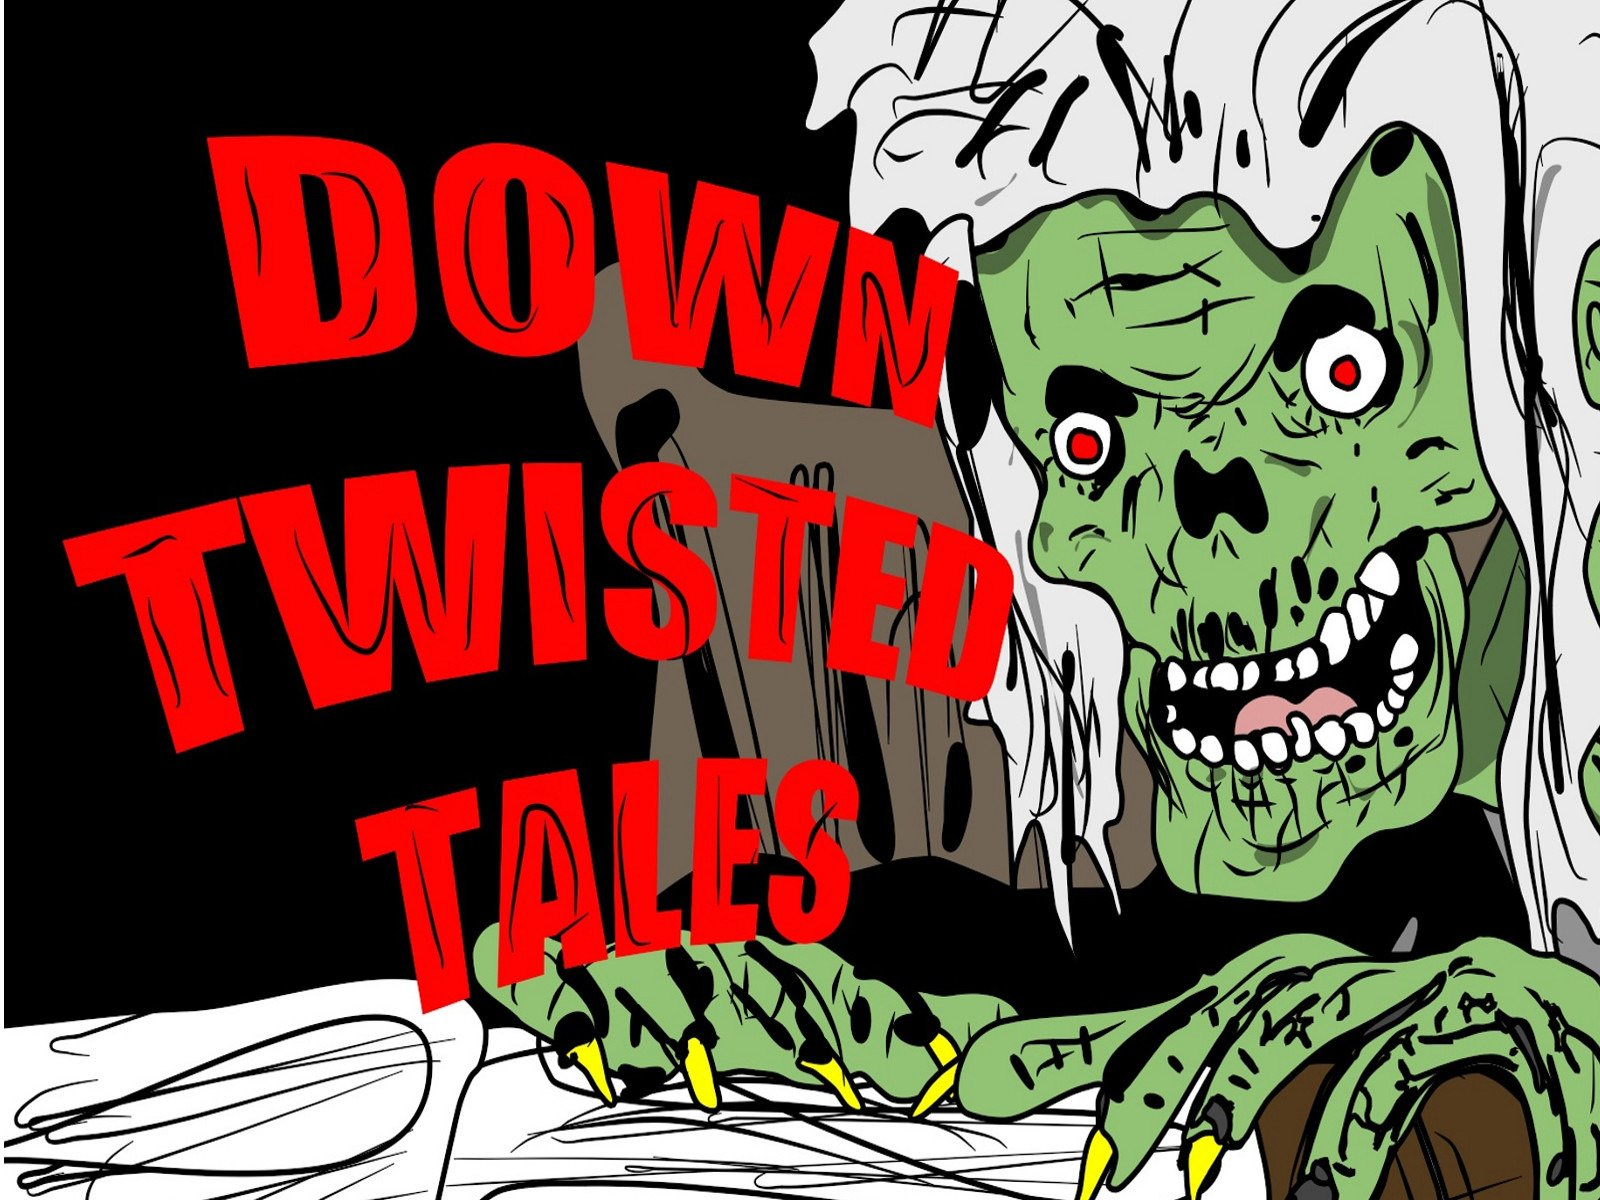 Down Twisted Tales - Season 1